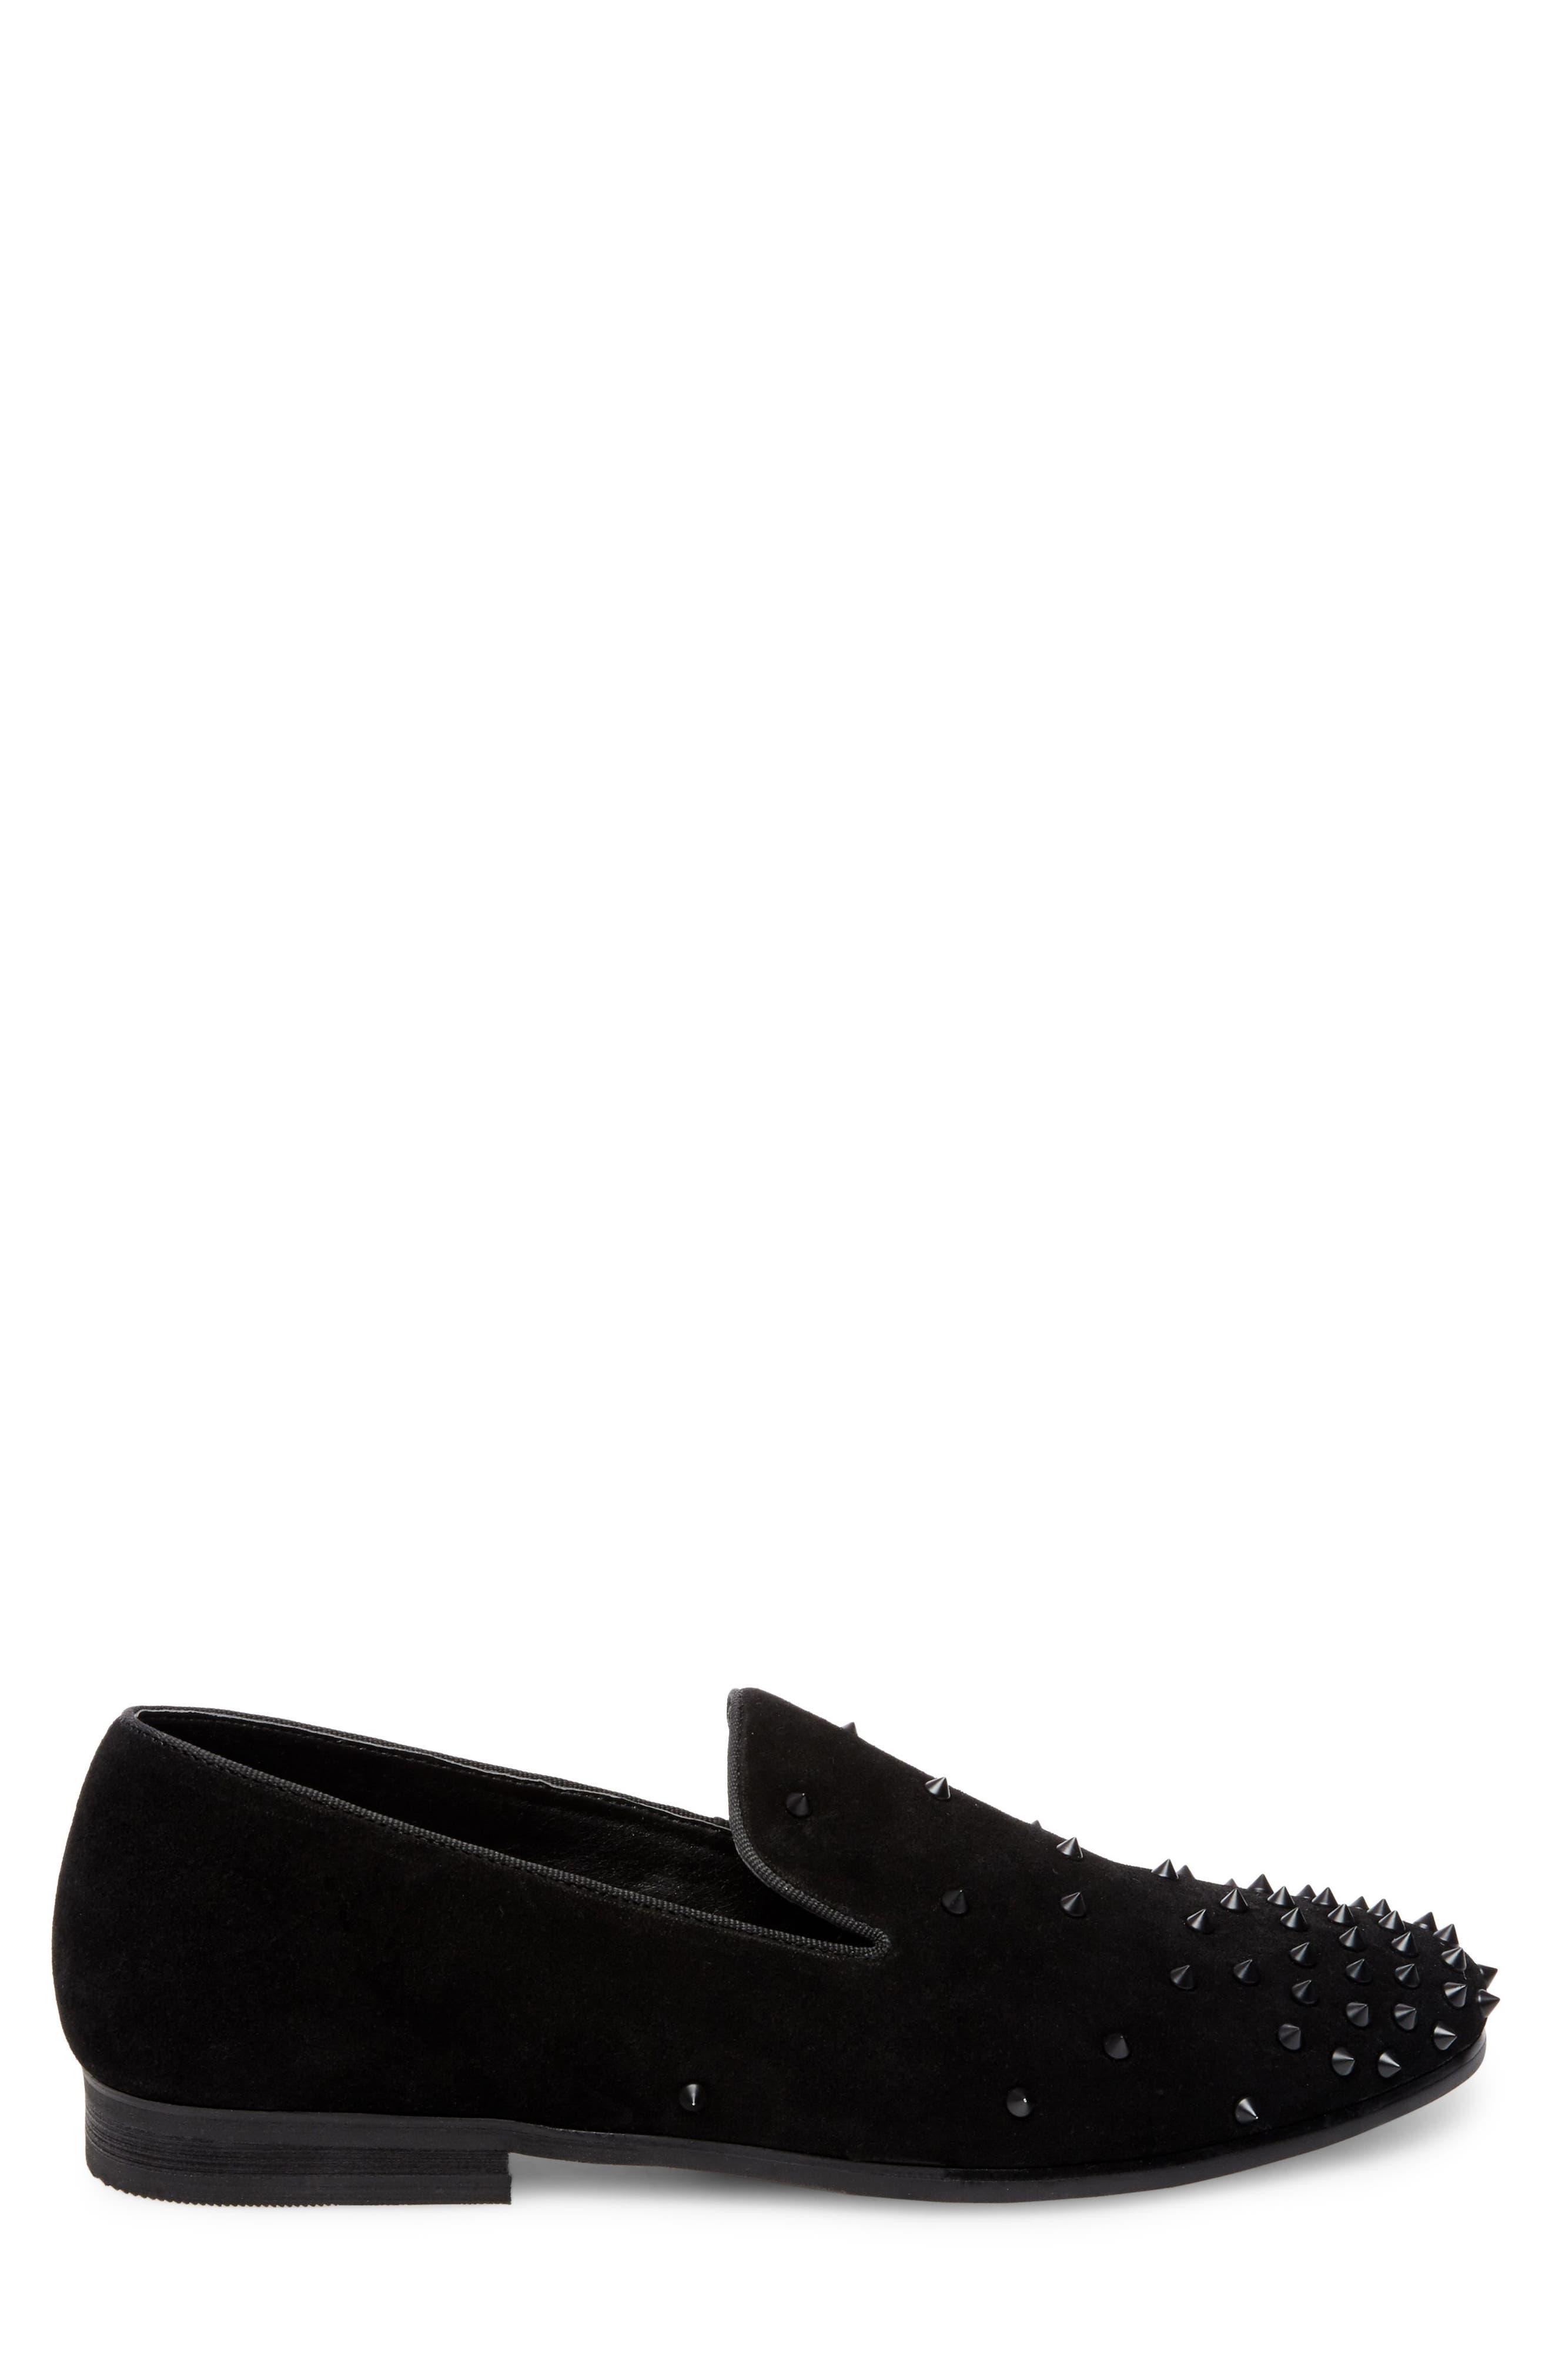 Cascade Studded Loafer,                             Alternate thumbnail 3, color,                             001